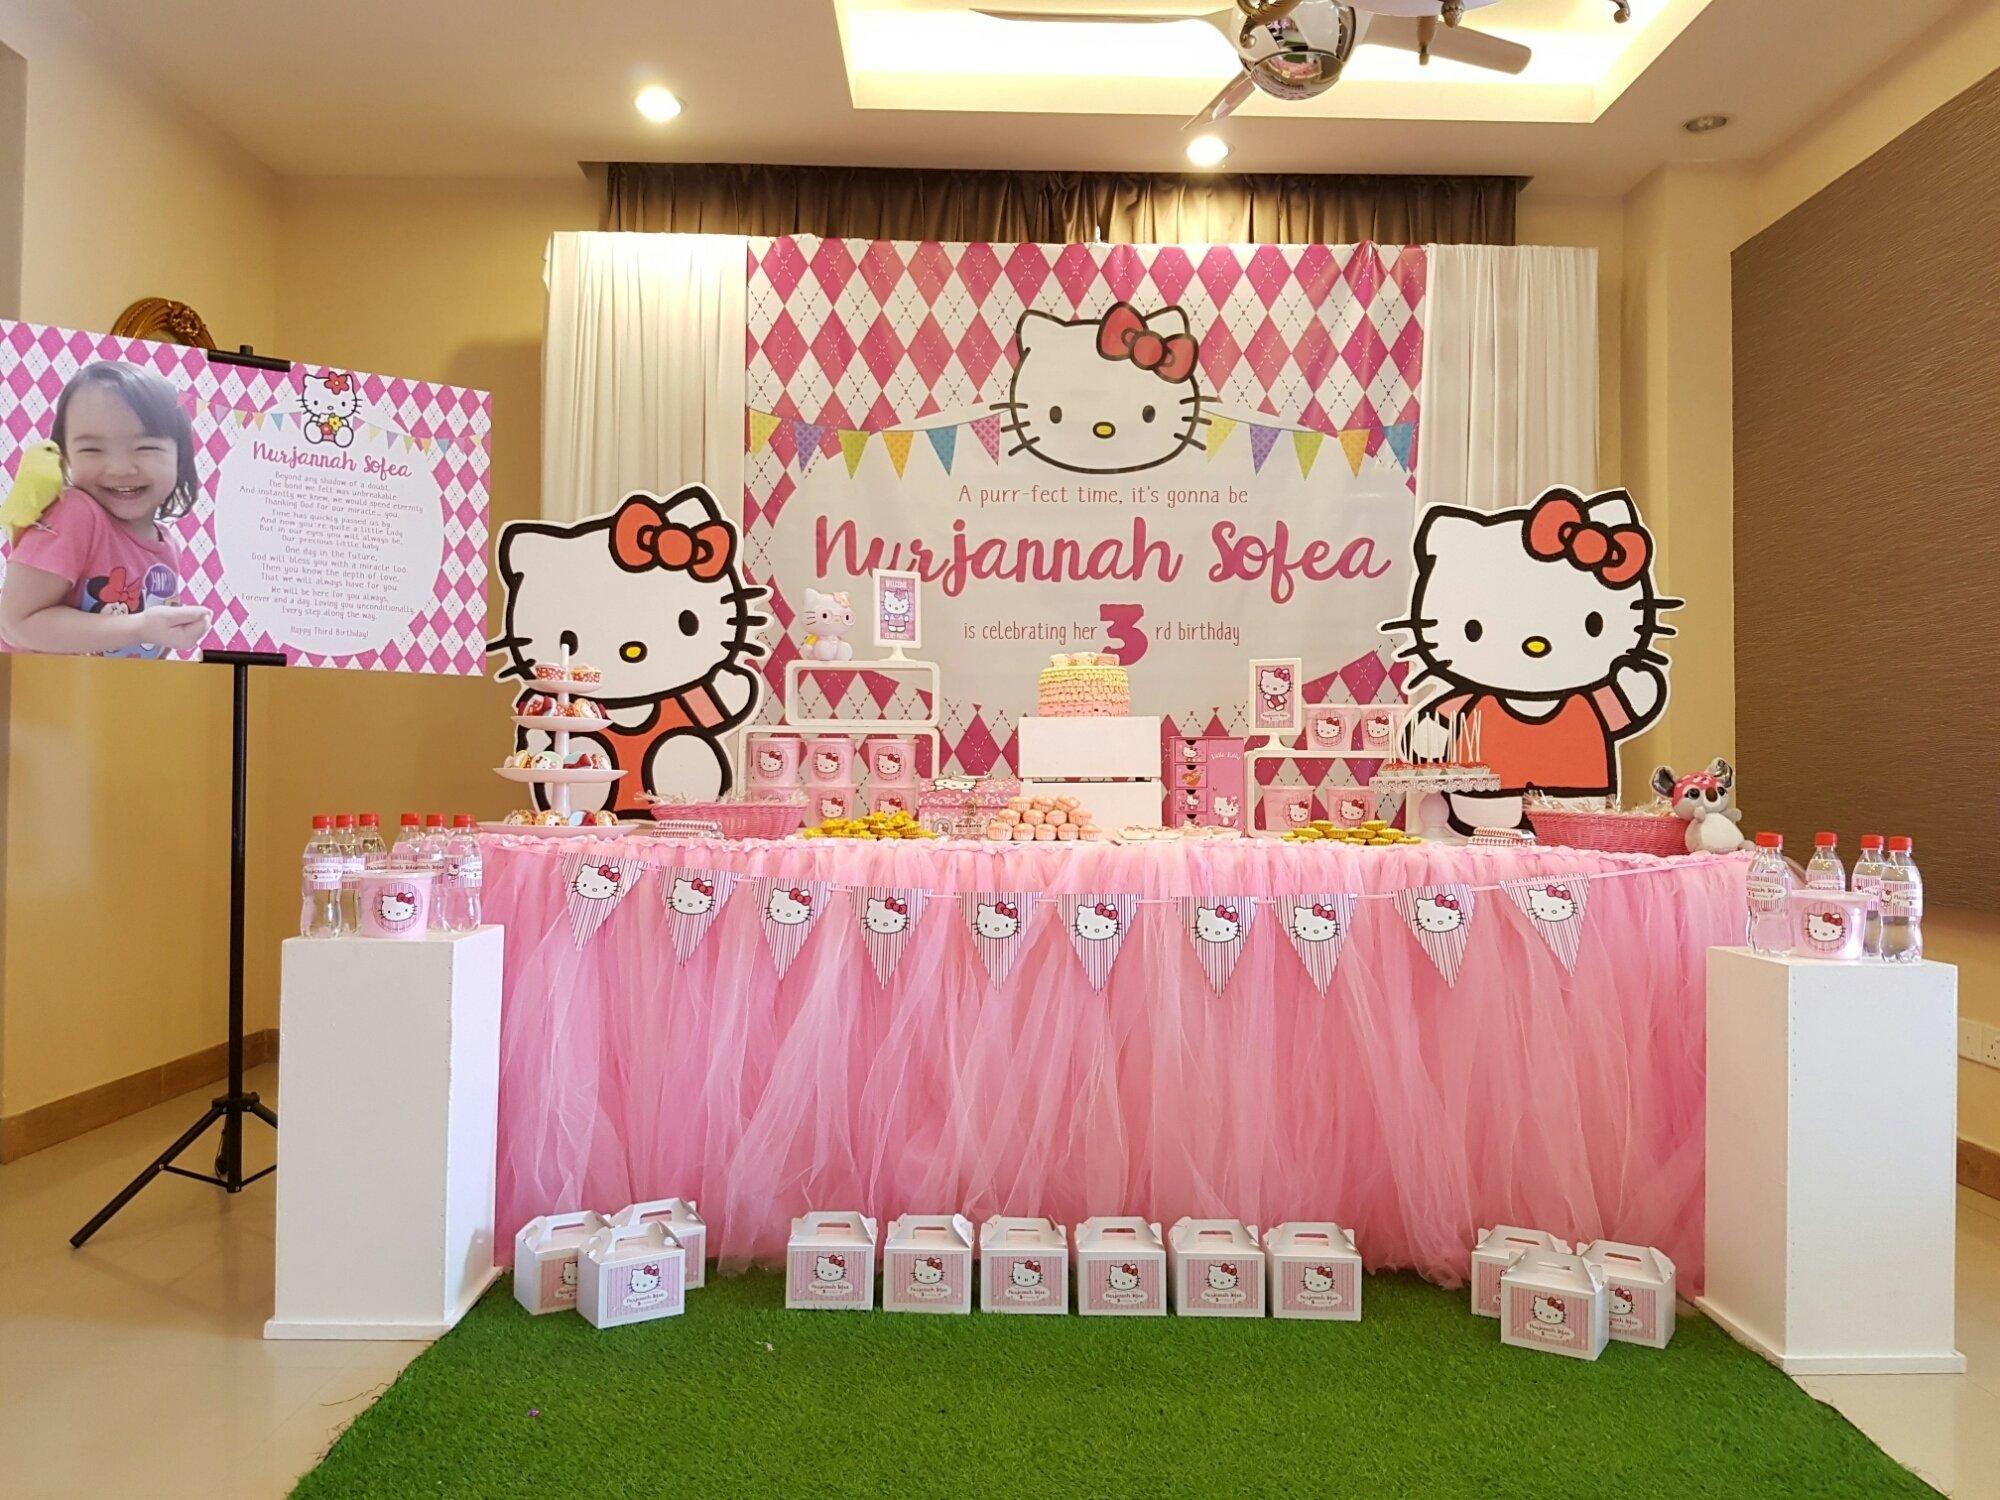 10 Cute Hello Kitty Theme Party Ideas & 10 Fashionable Hello Kitty Theme Party Ideas